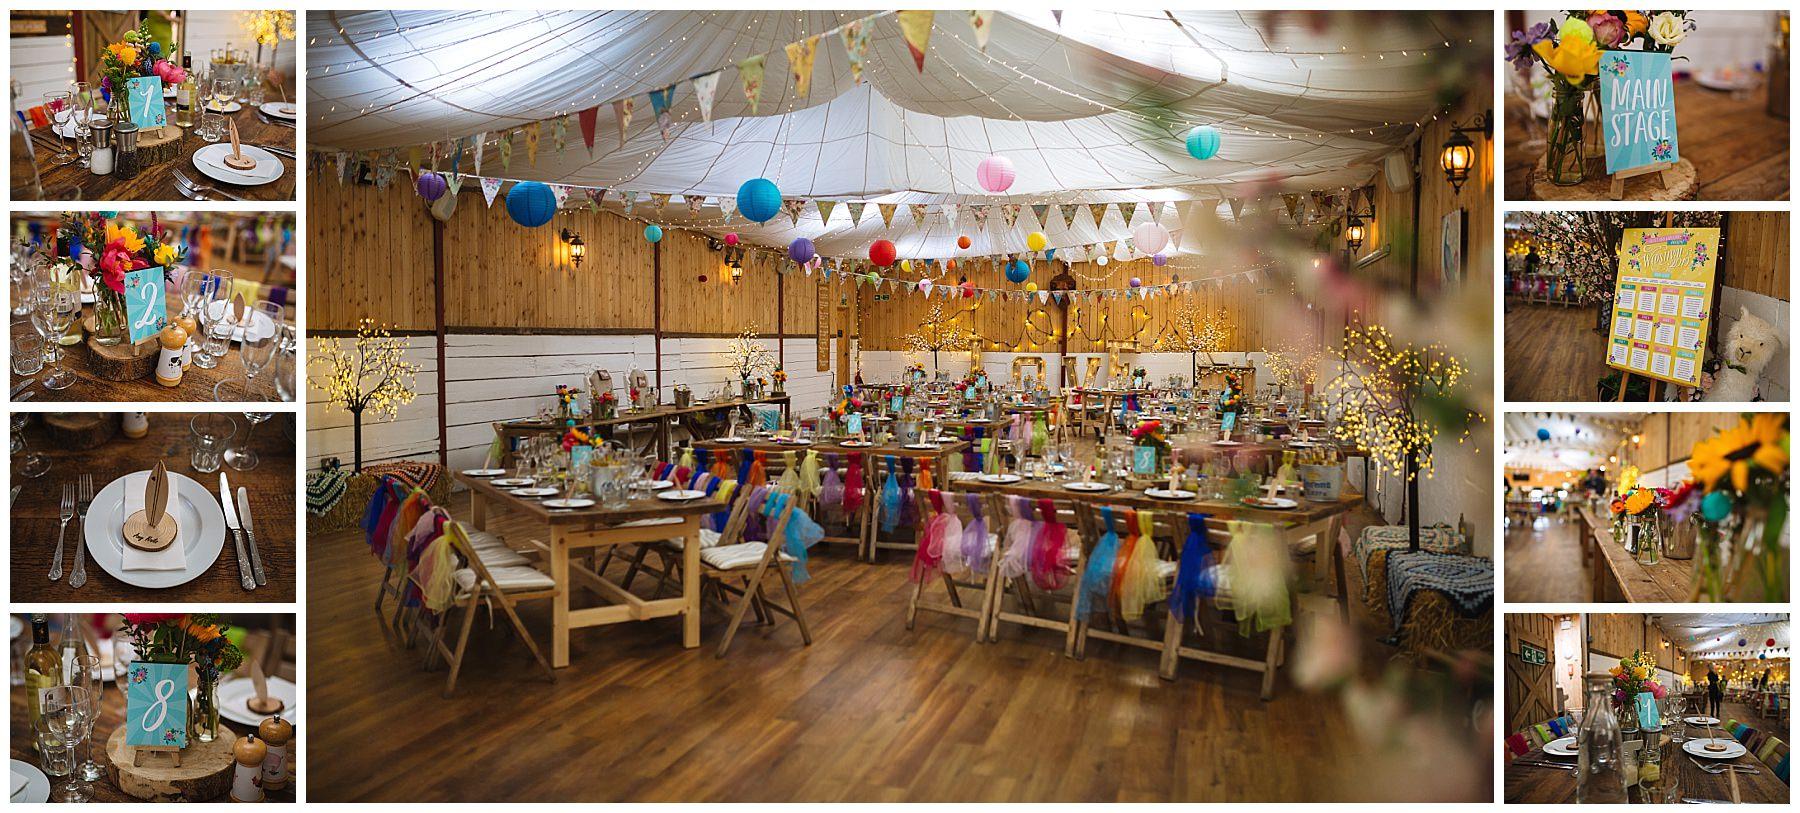 rustic barn wedding venue decoration inspiration